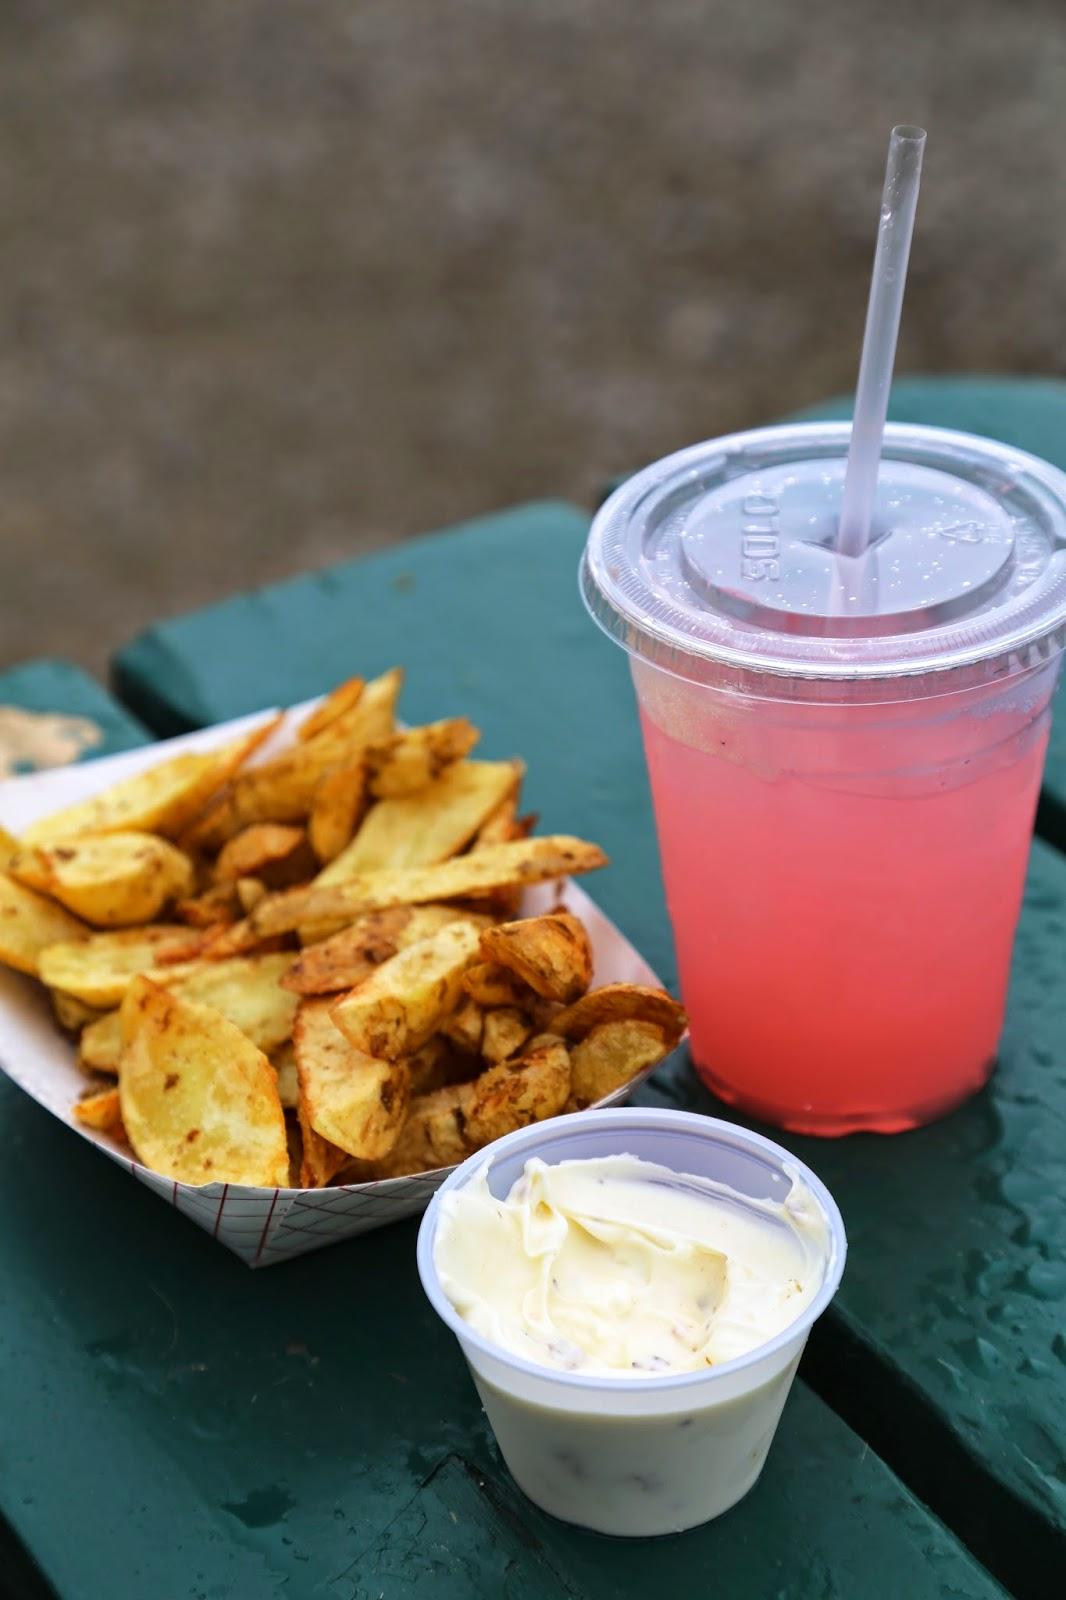 Rhubarb lemonade and peanut potato fries, Alaska State Fair